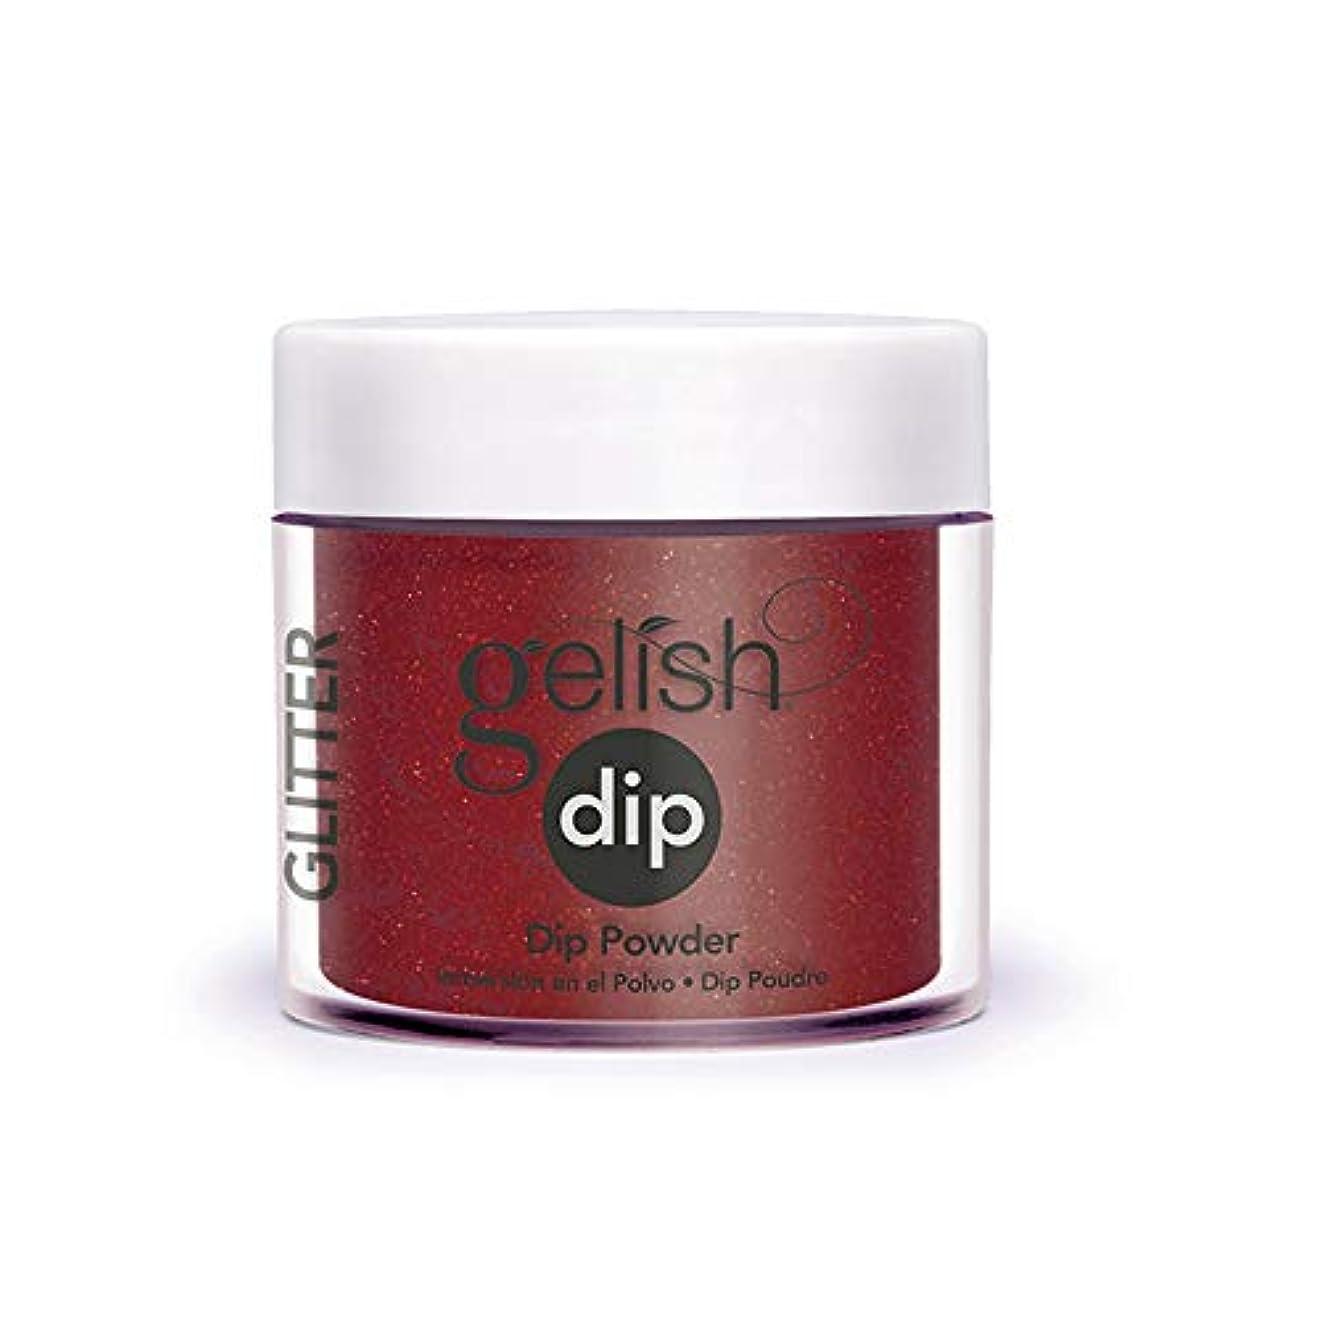 作物意見叫び声Harmony Gelish - Acrylic Dip Powder - Good Gossip - 23g / 0.8oz